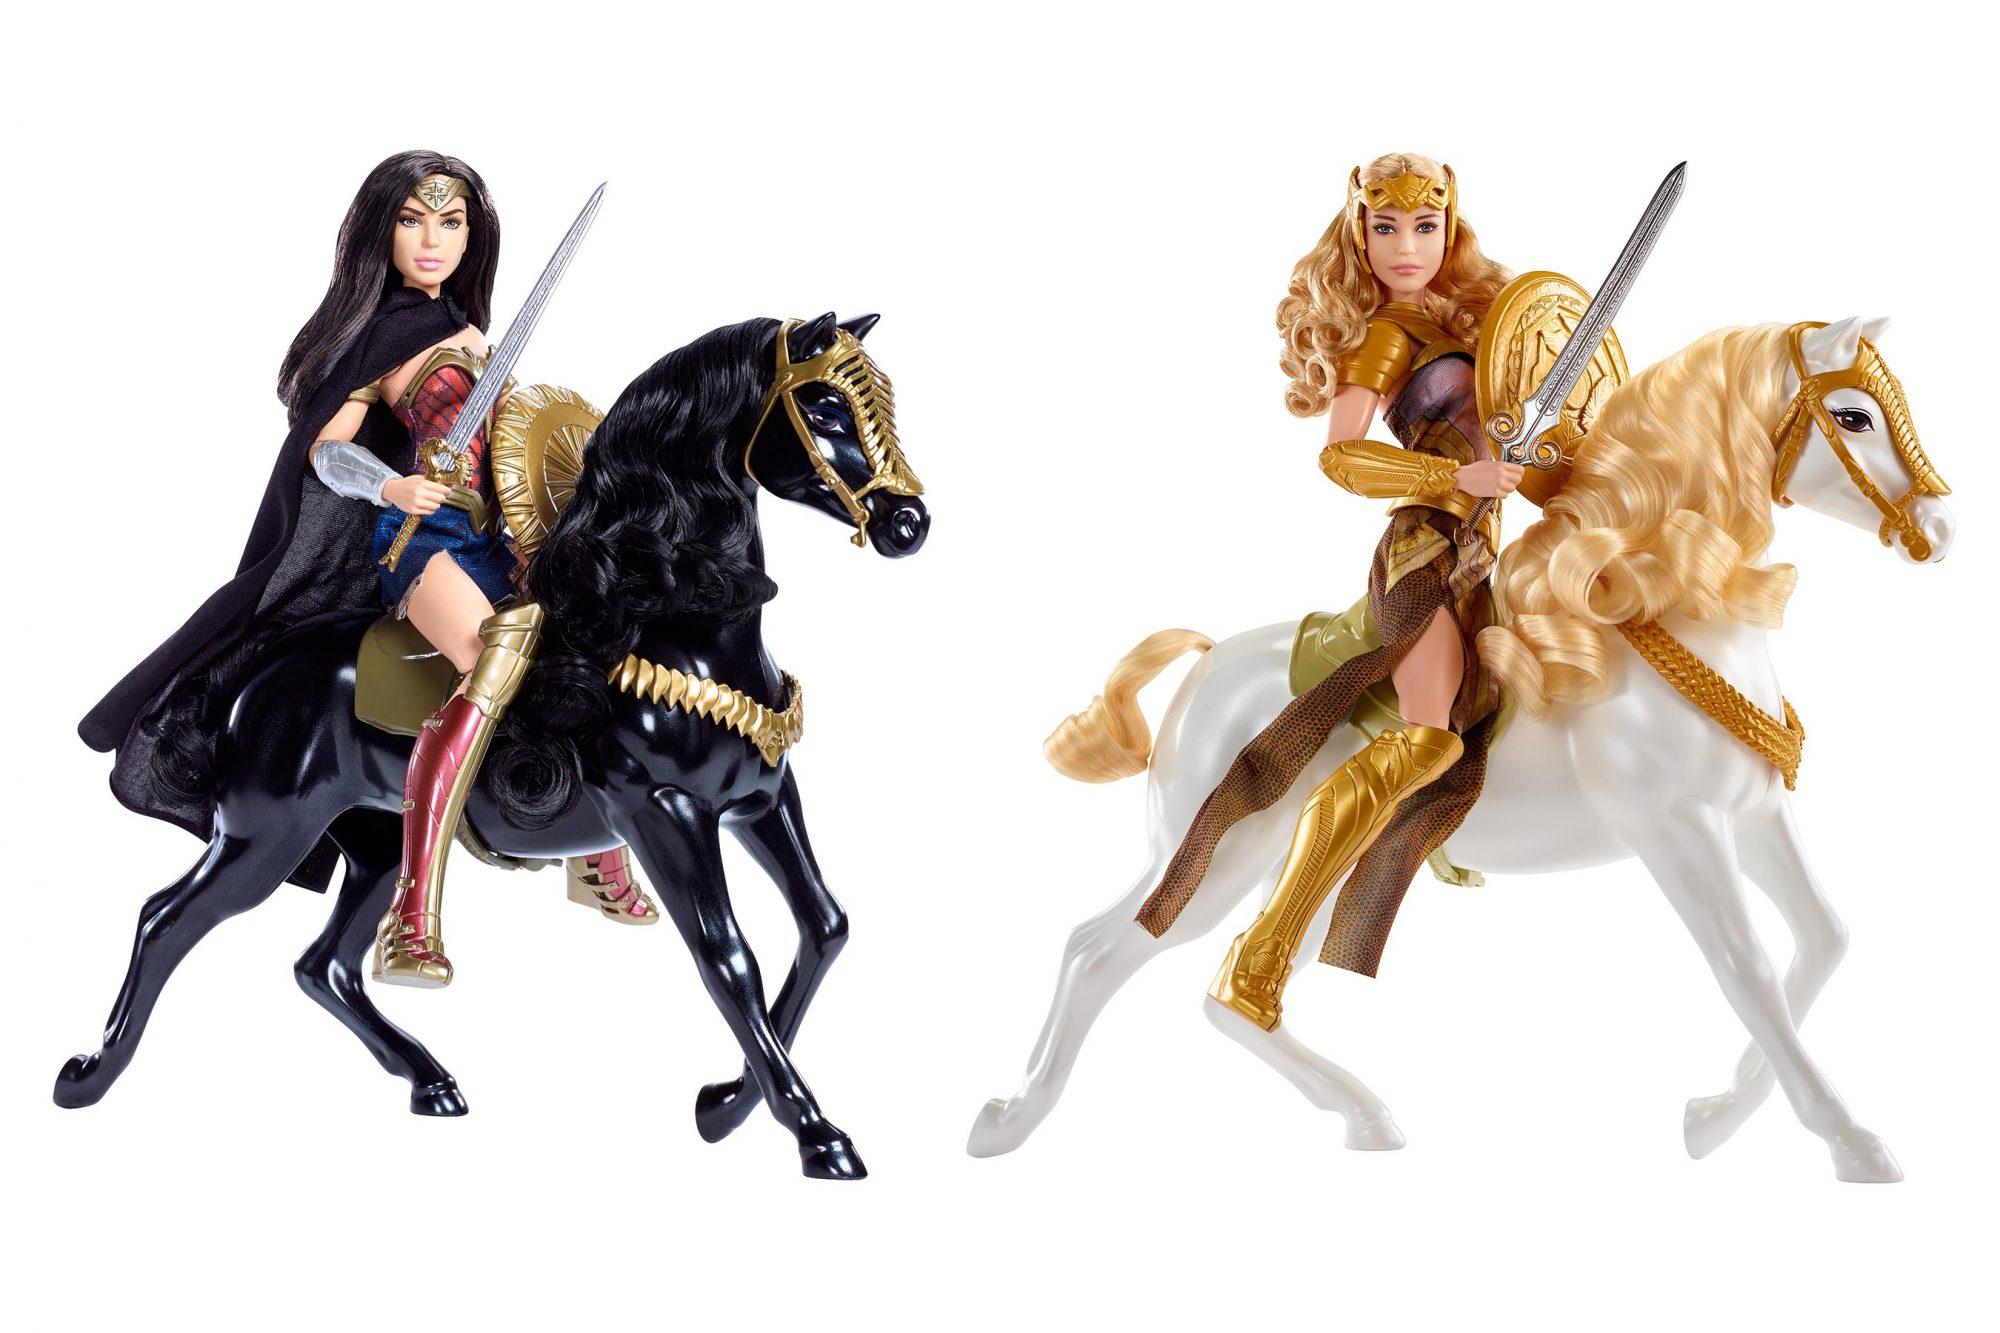 Wonder Woman Dolls CR: Mattel